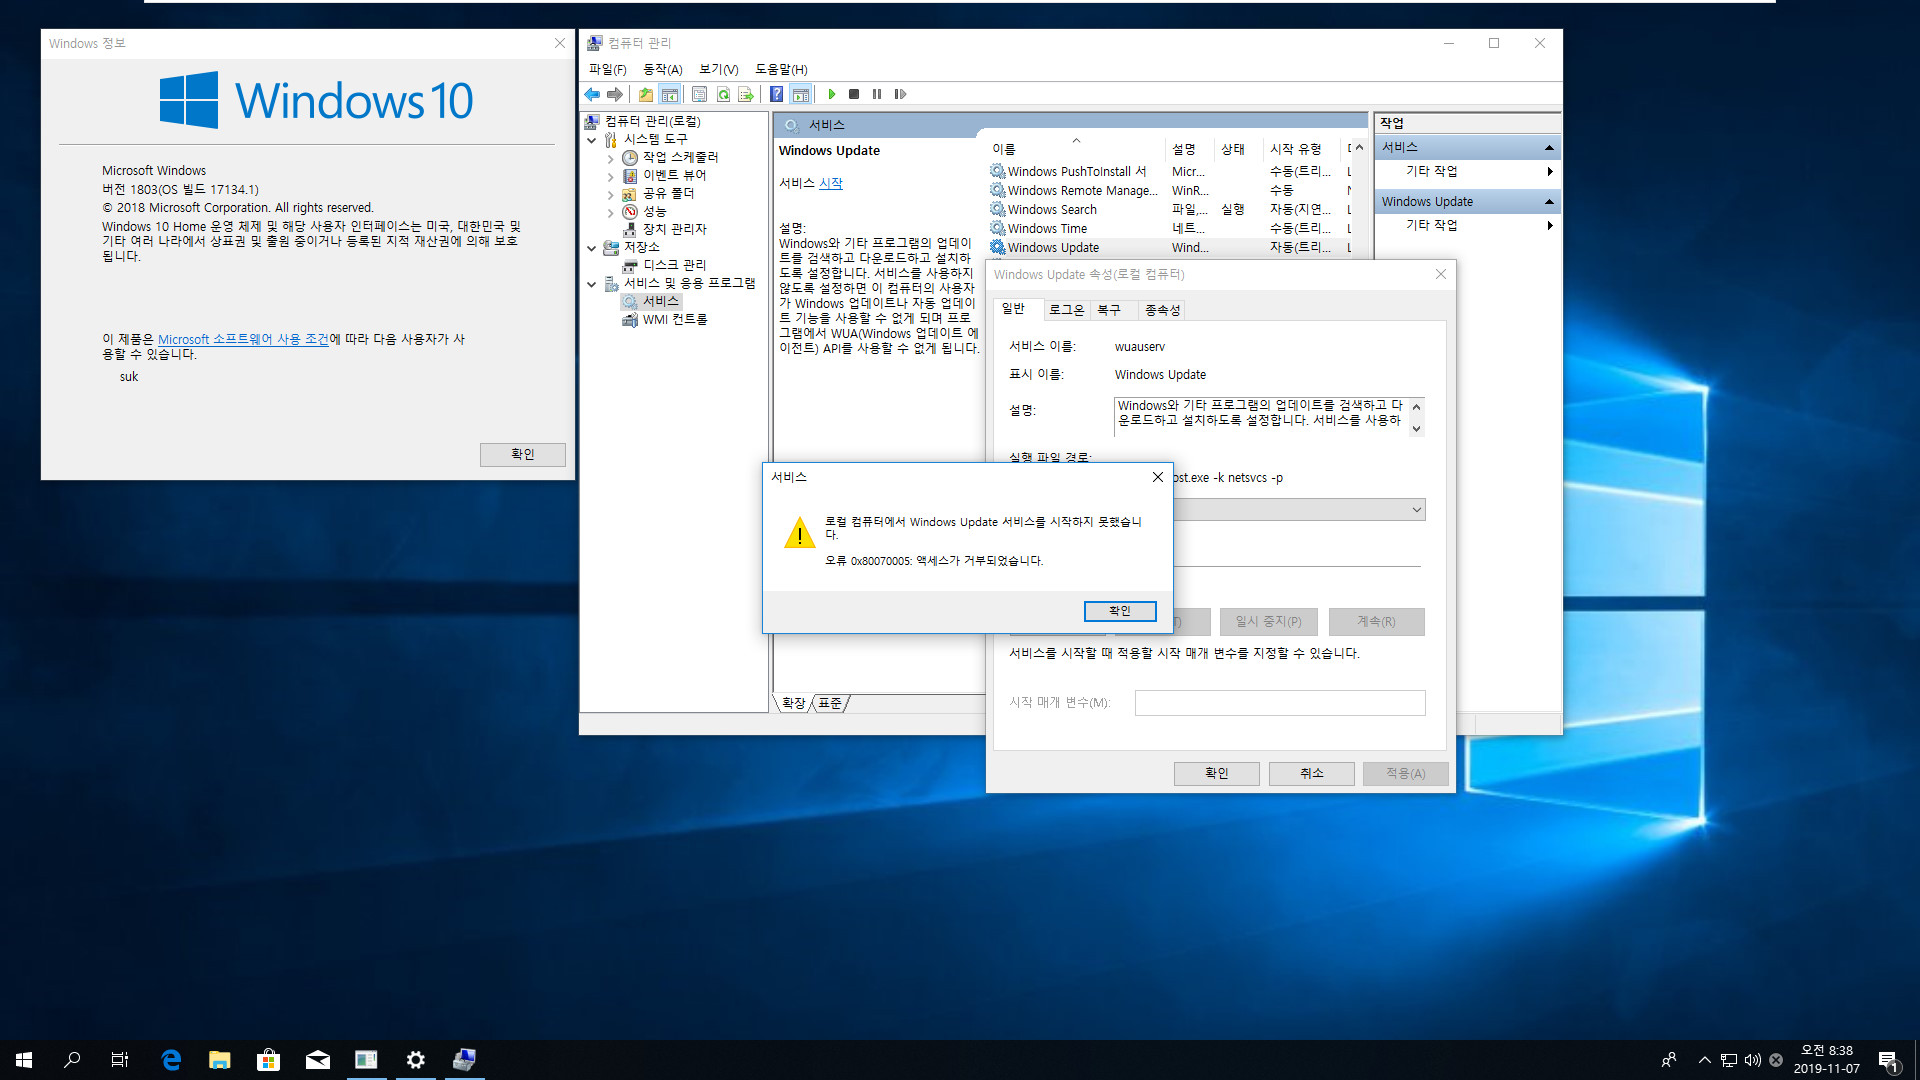 Windows 10 업데이트 방지하기 [업데이트 다운로드 폴더 사용 금지].bat 테스트 - 버전 1803, Home 에서 버전 1903 기능 업데이트 방지하기 2019-11-07_083817.jpg